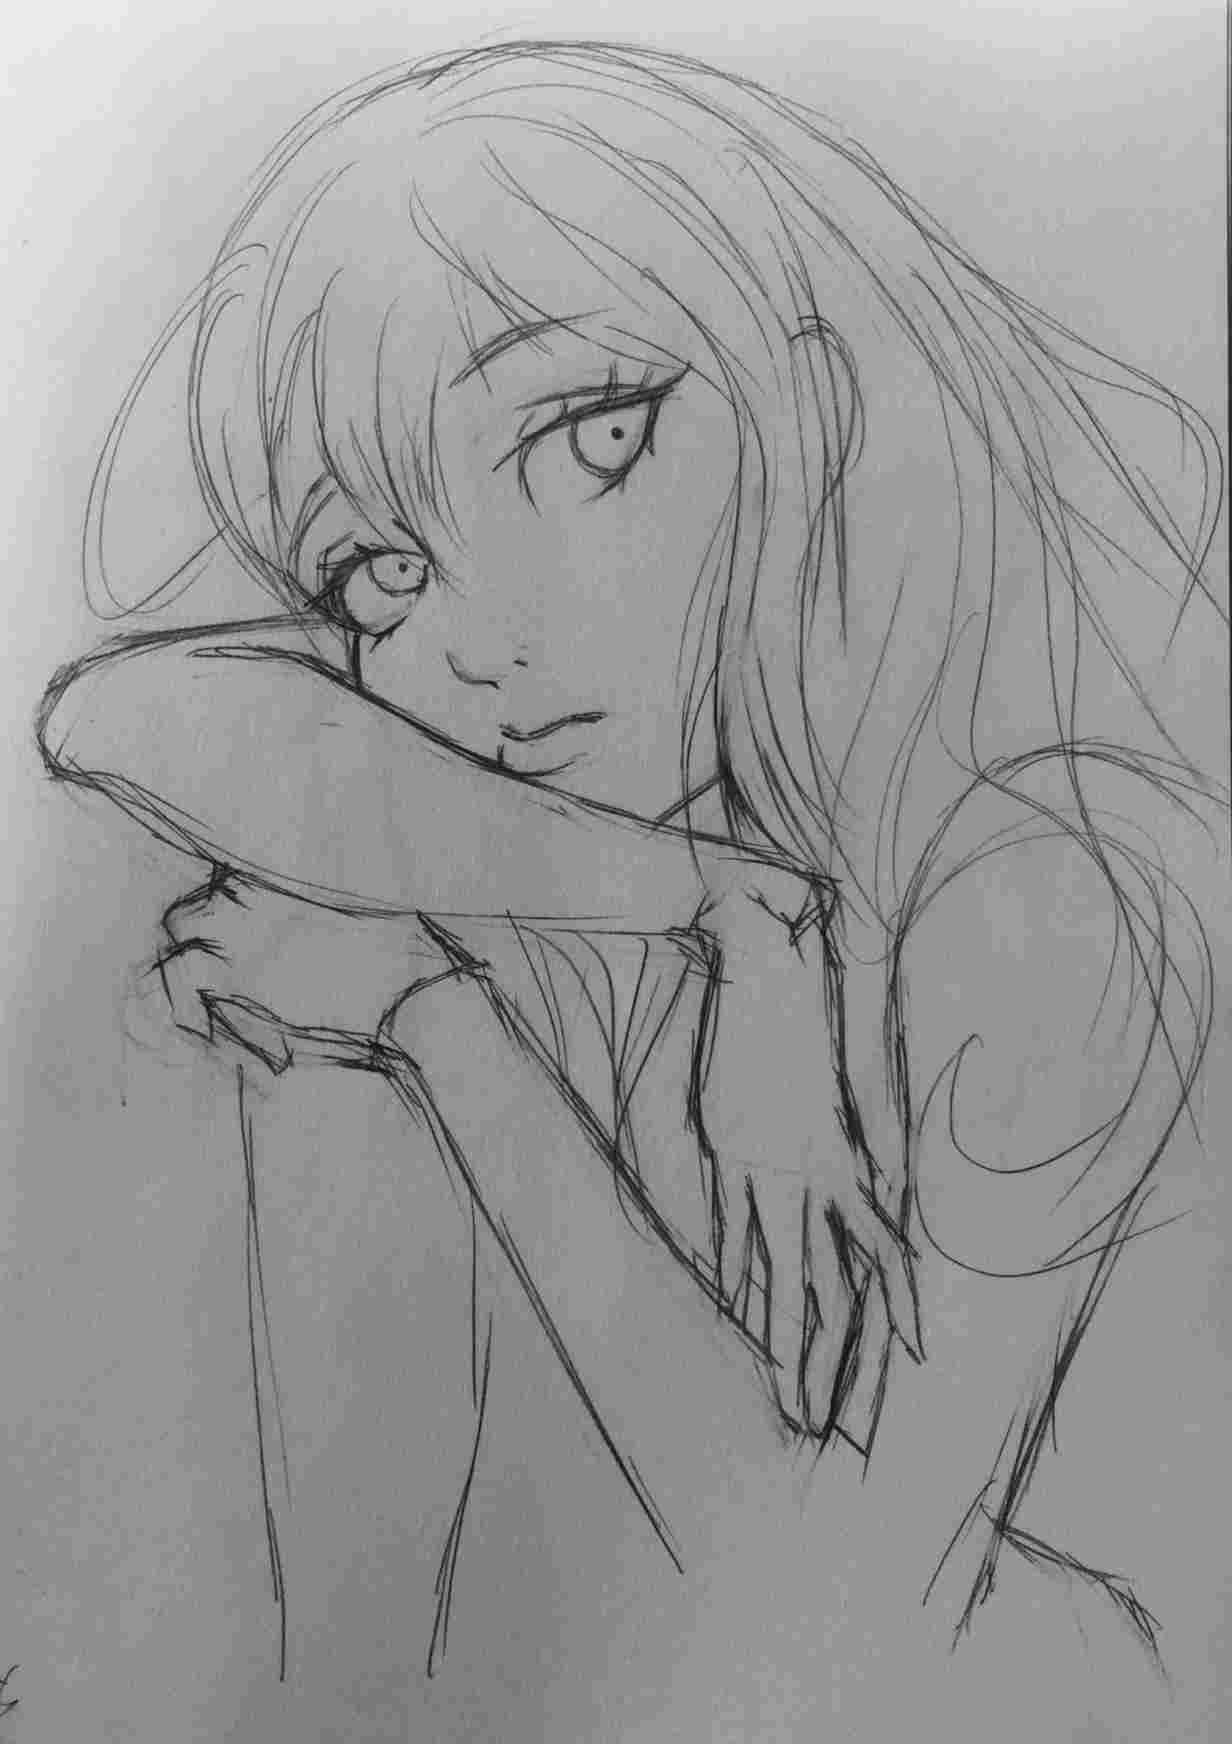 Anime Sad Drawing Wallpapers - Wallpaper Cave